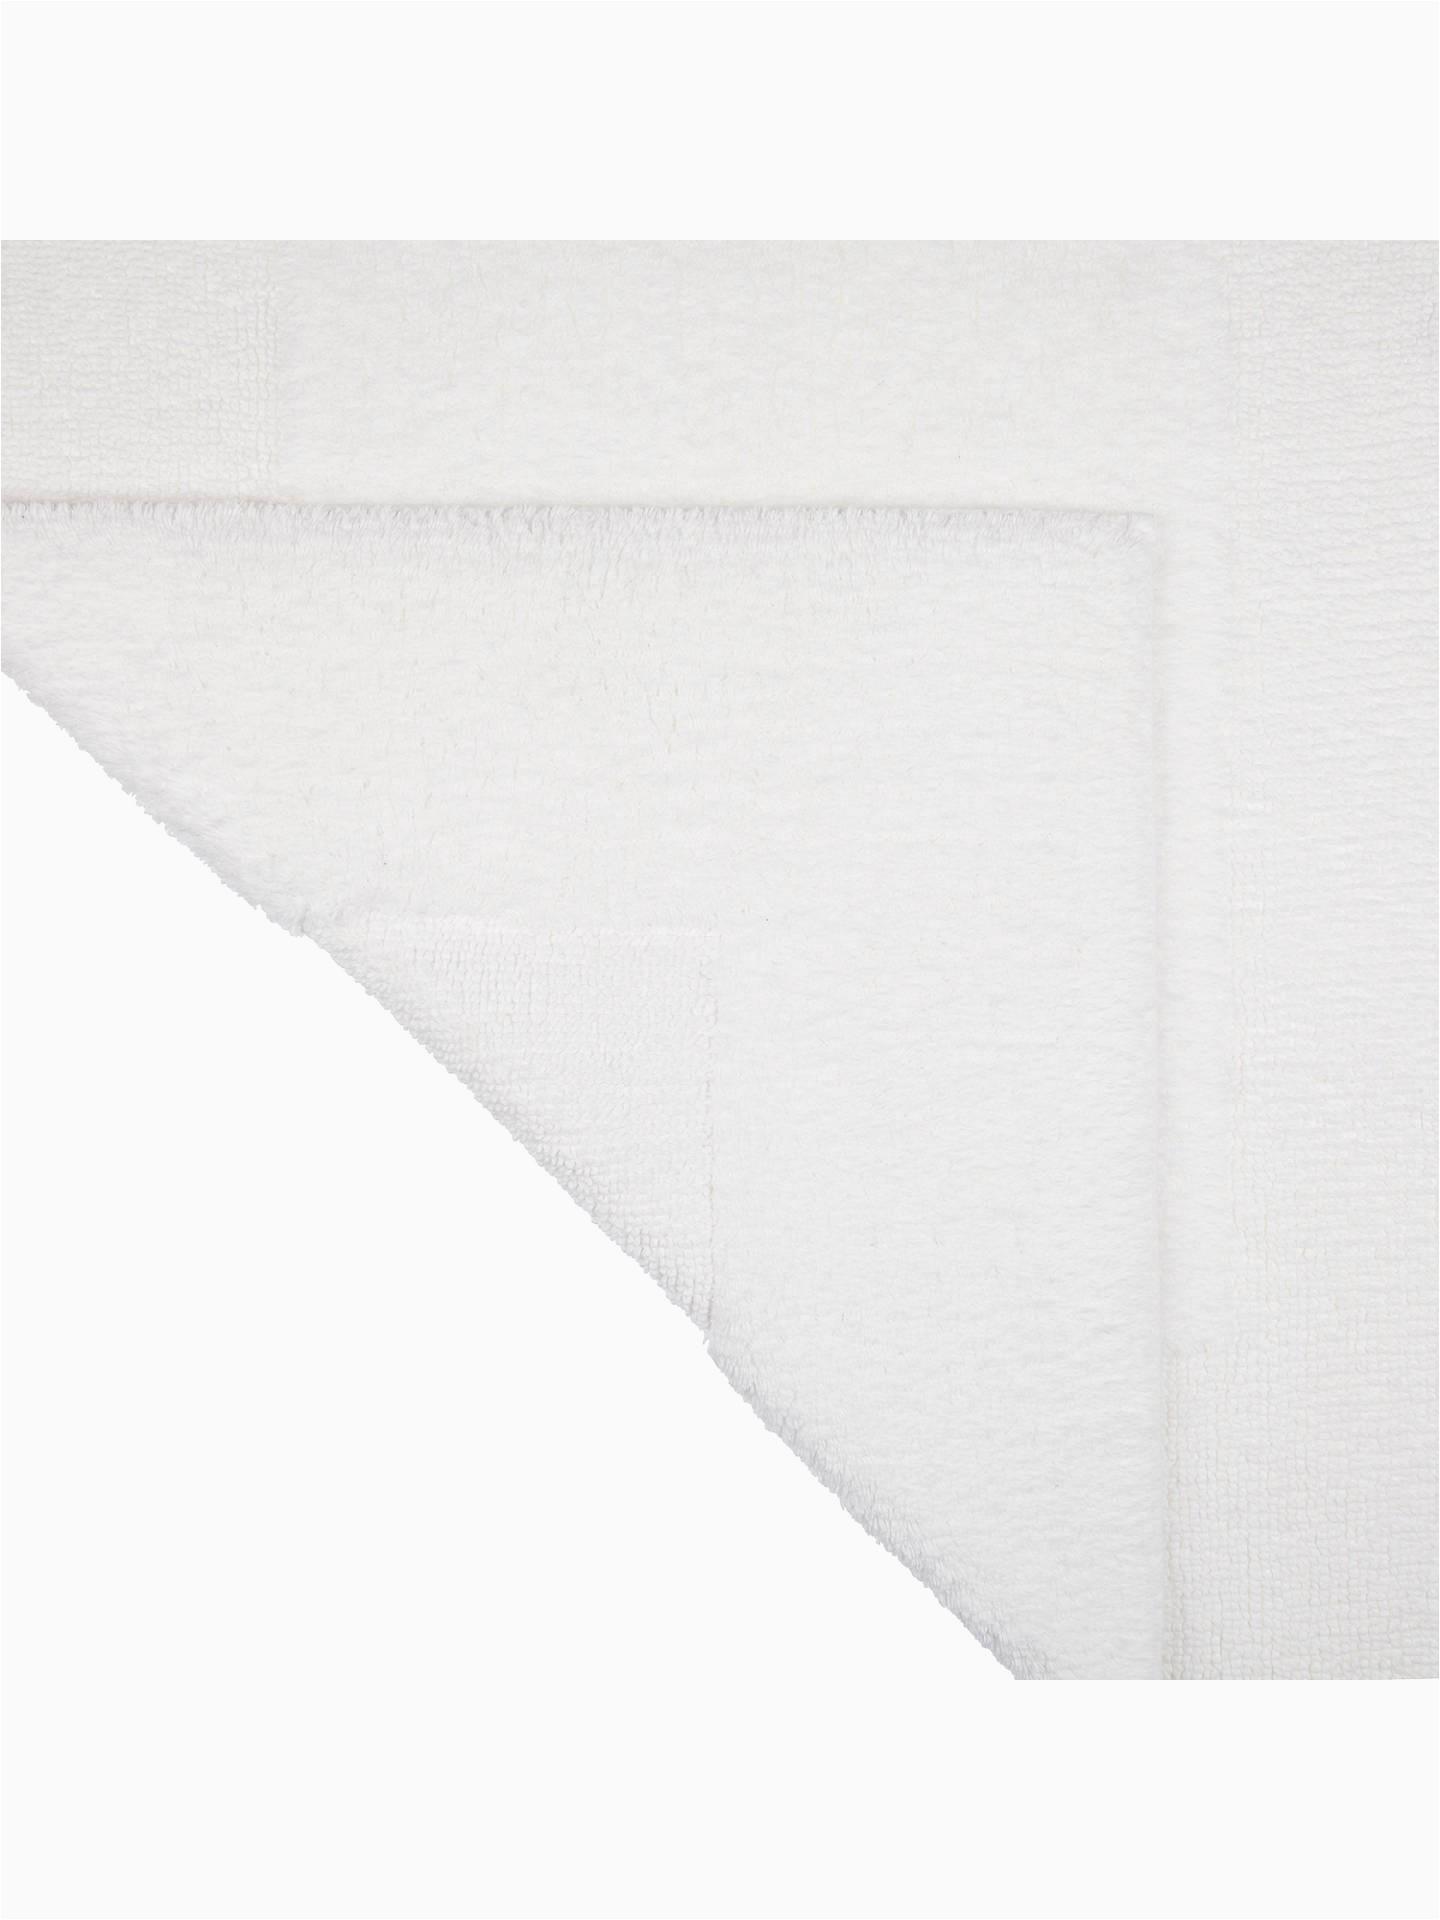 Elizabeth Arden Bath Rug John Lewis Supreme Reversible Bath Rug Extra White